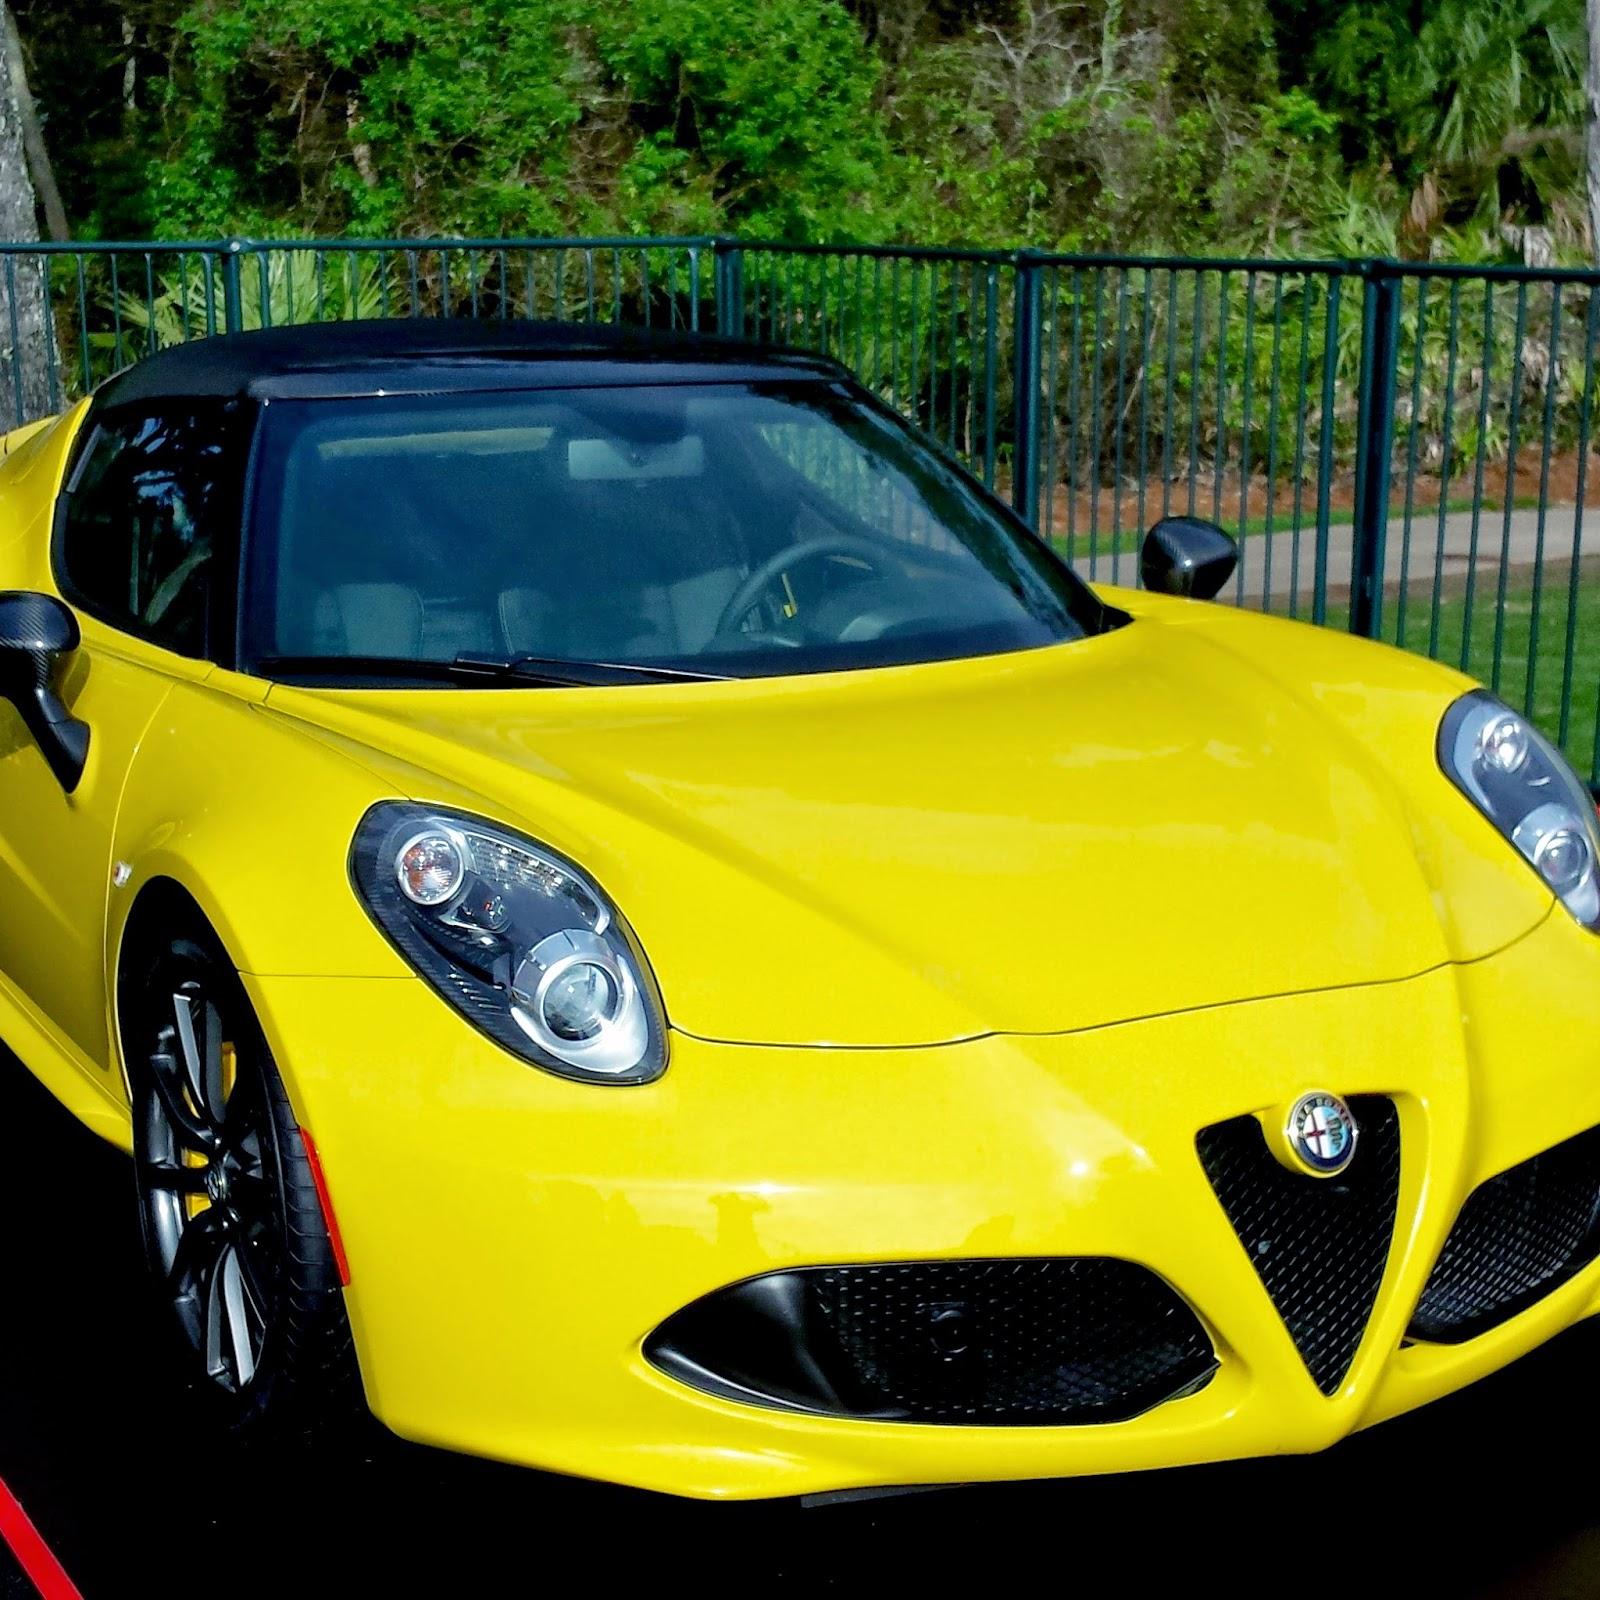 Bob-Boyd Alfa Romeo Of Columbus: Alfa Romeo 4C Spider